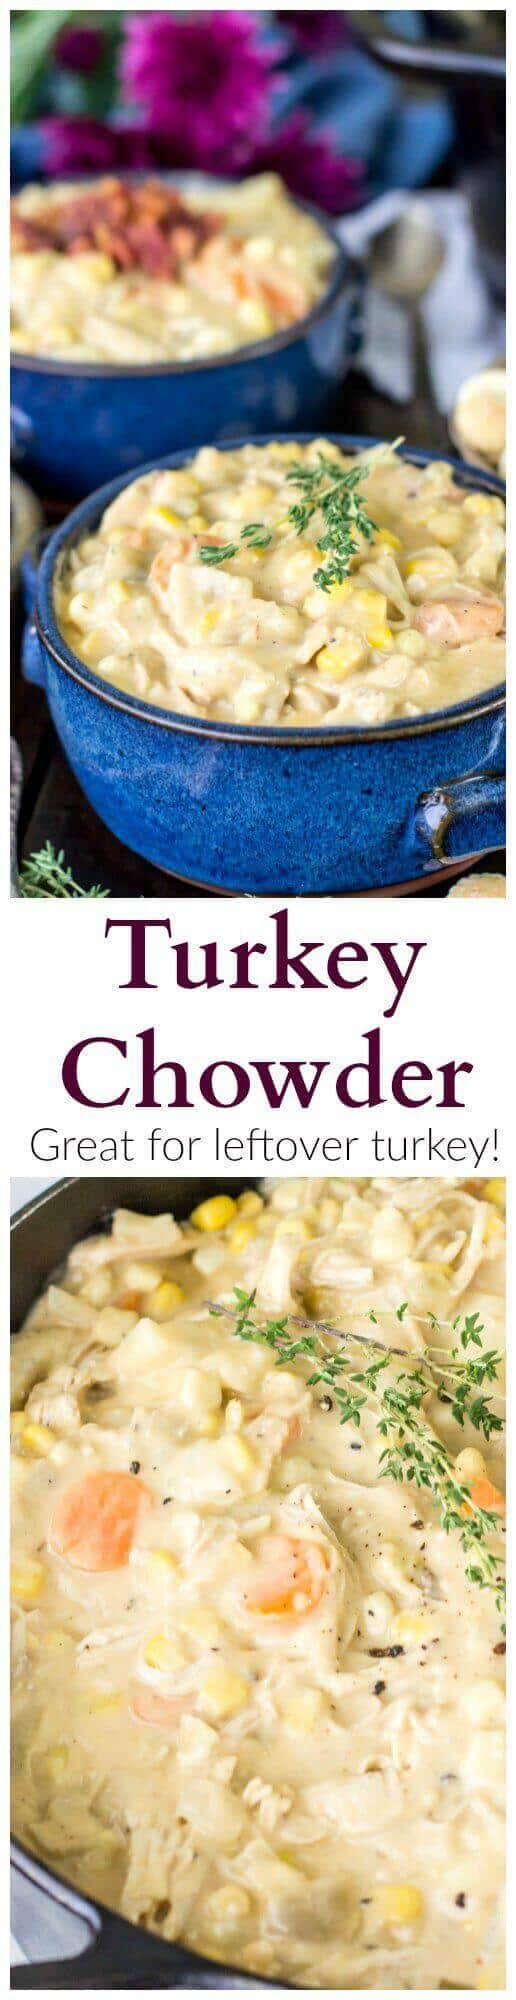 turkey-chowder-great-for-leftover-turkey